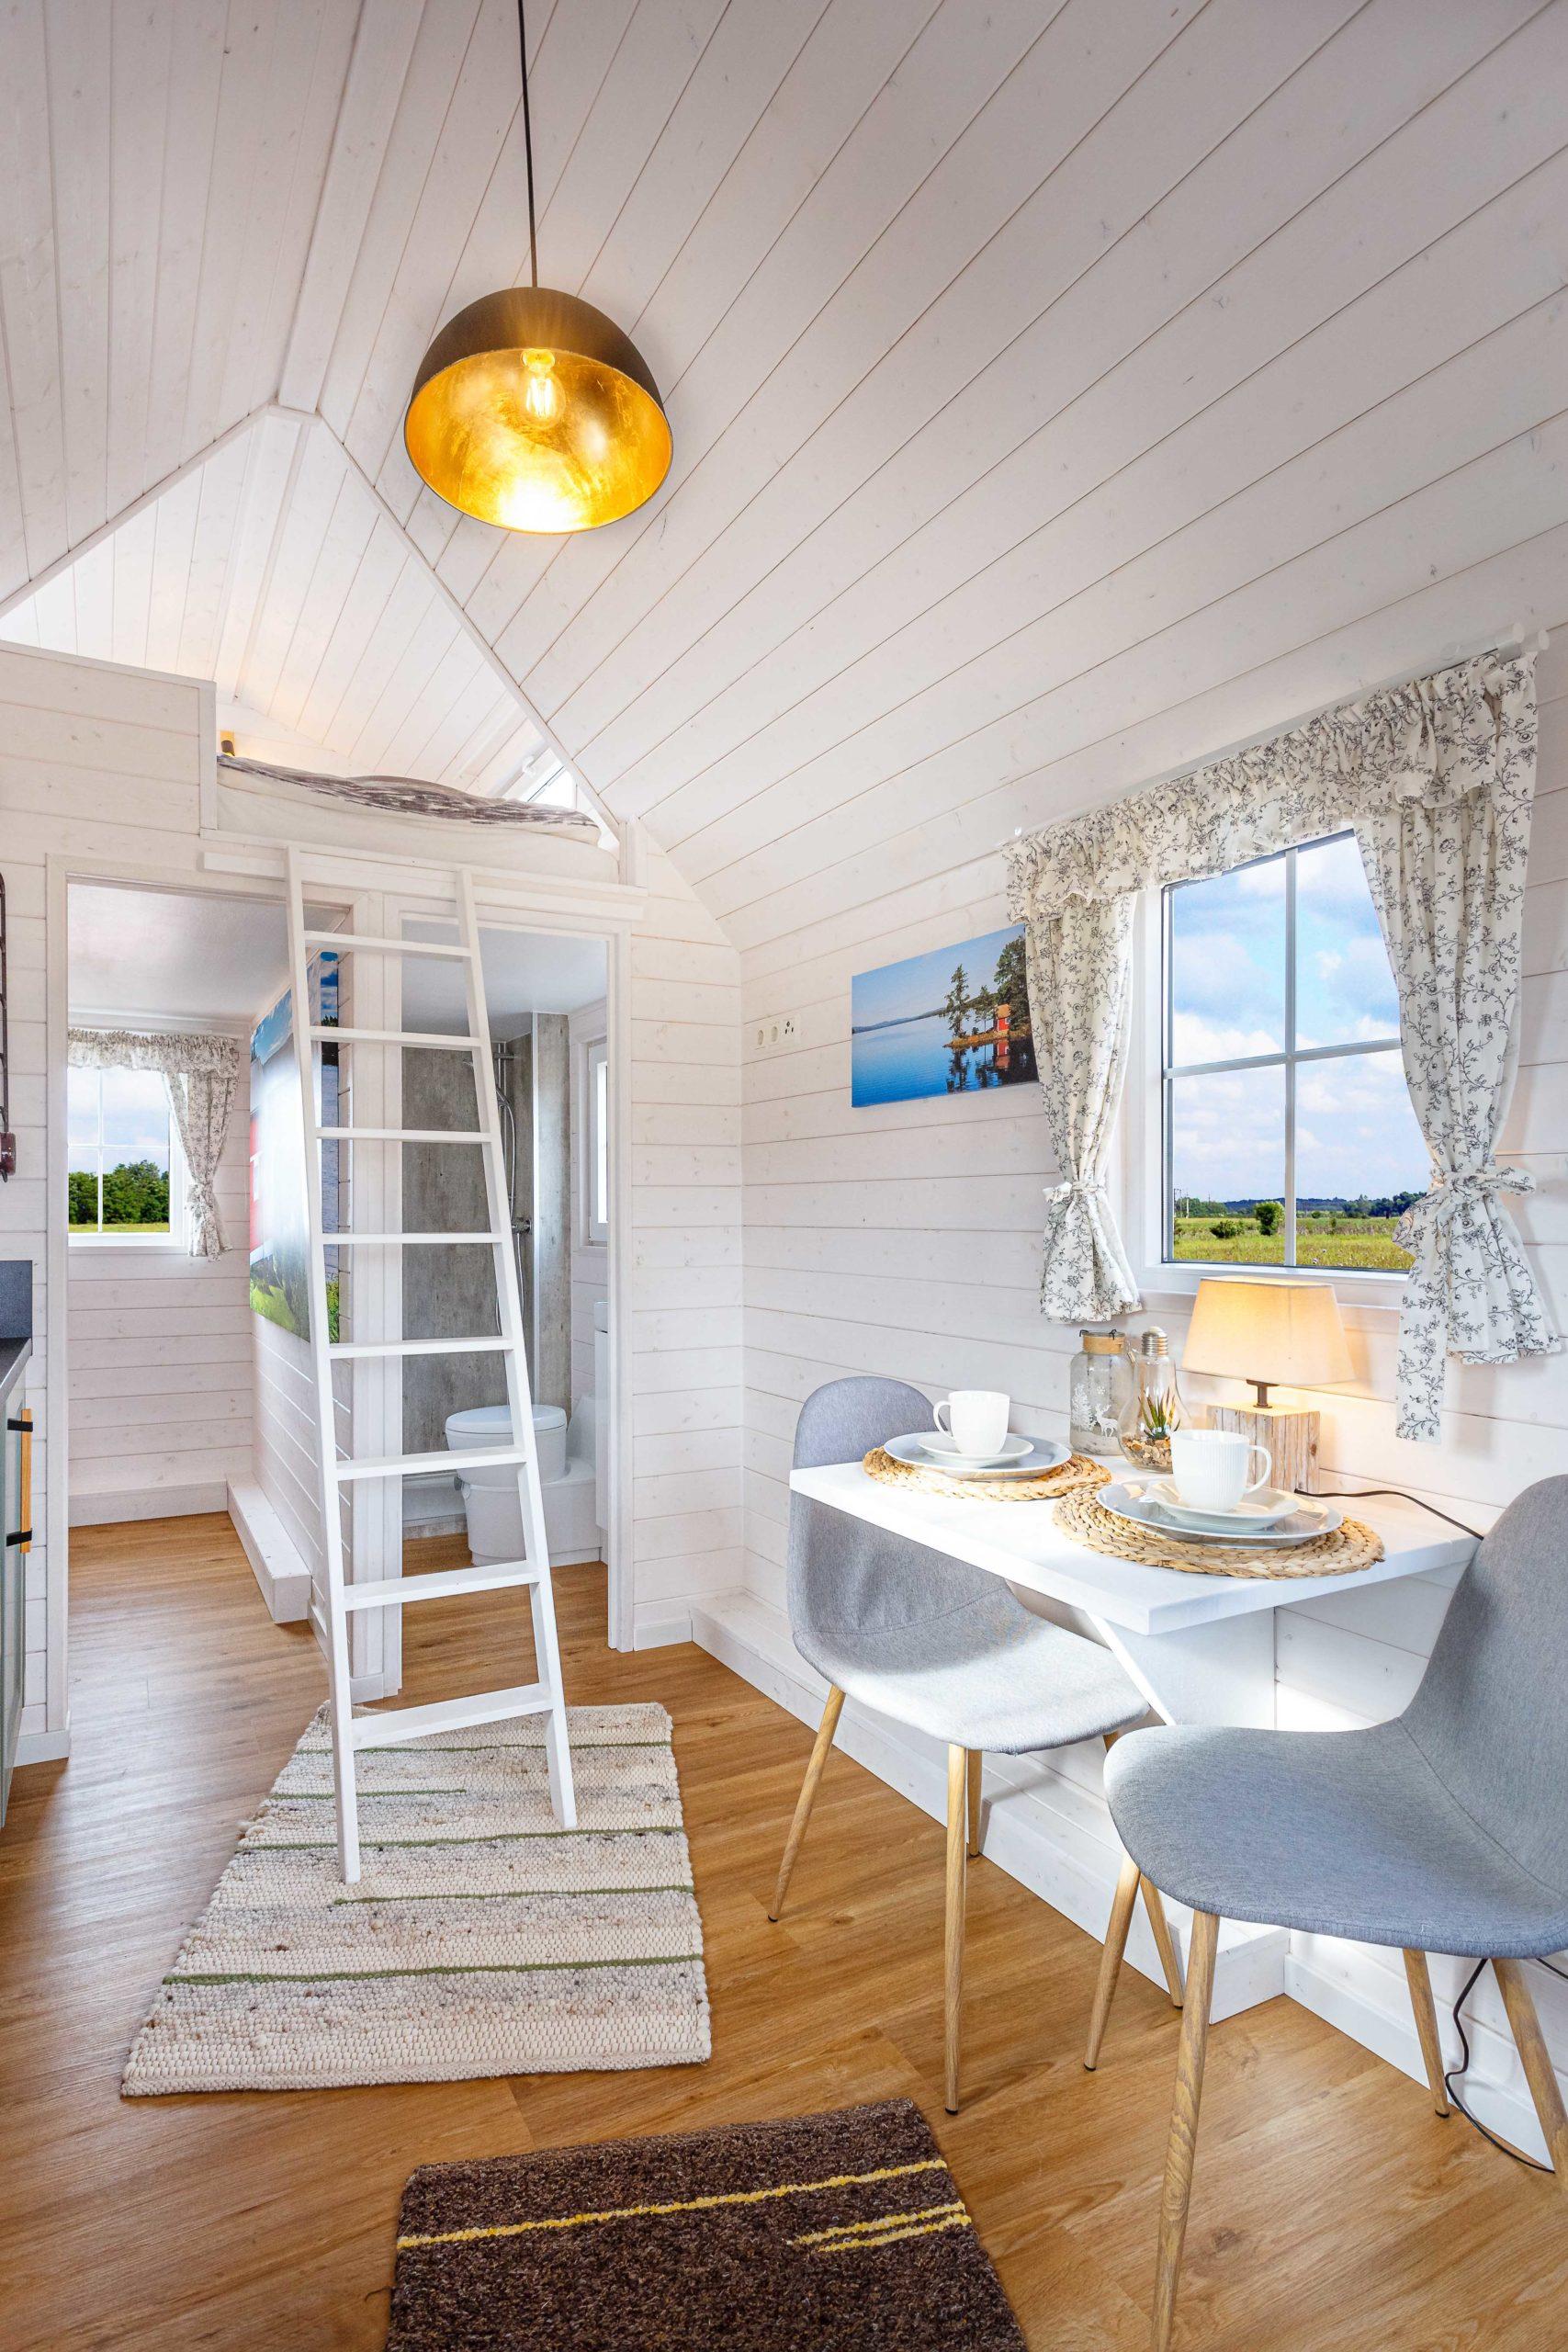 mobiles-tiny-house-schweden-vital-camp-gmbh-11